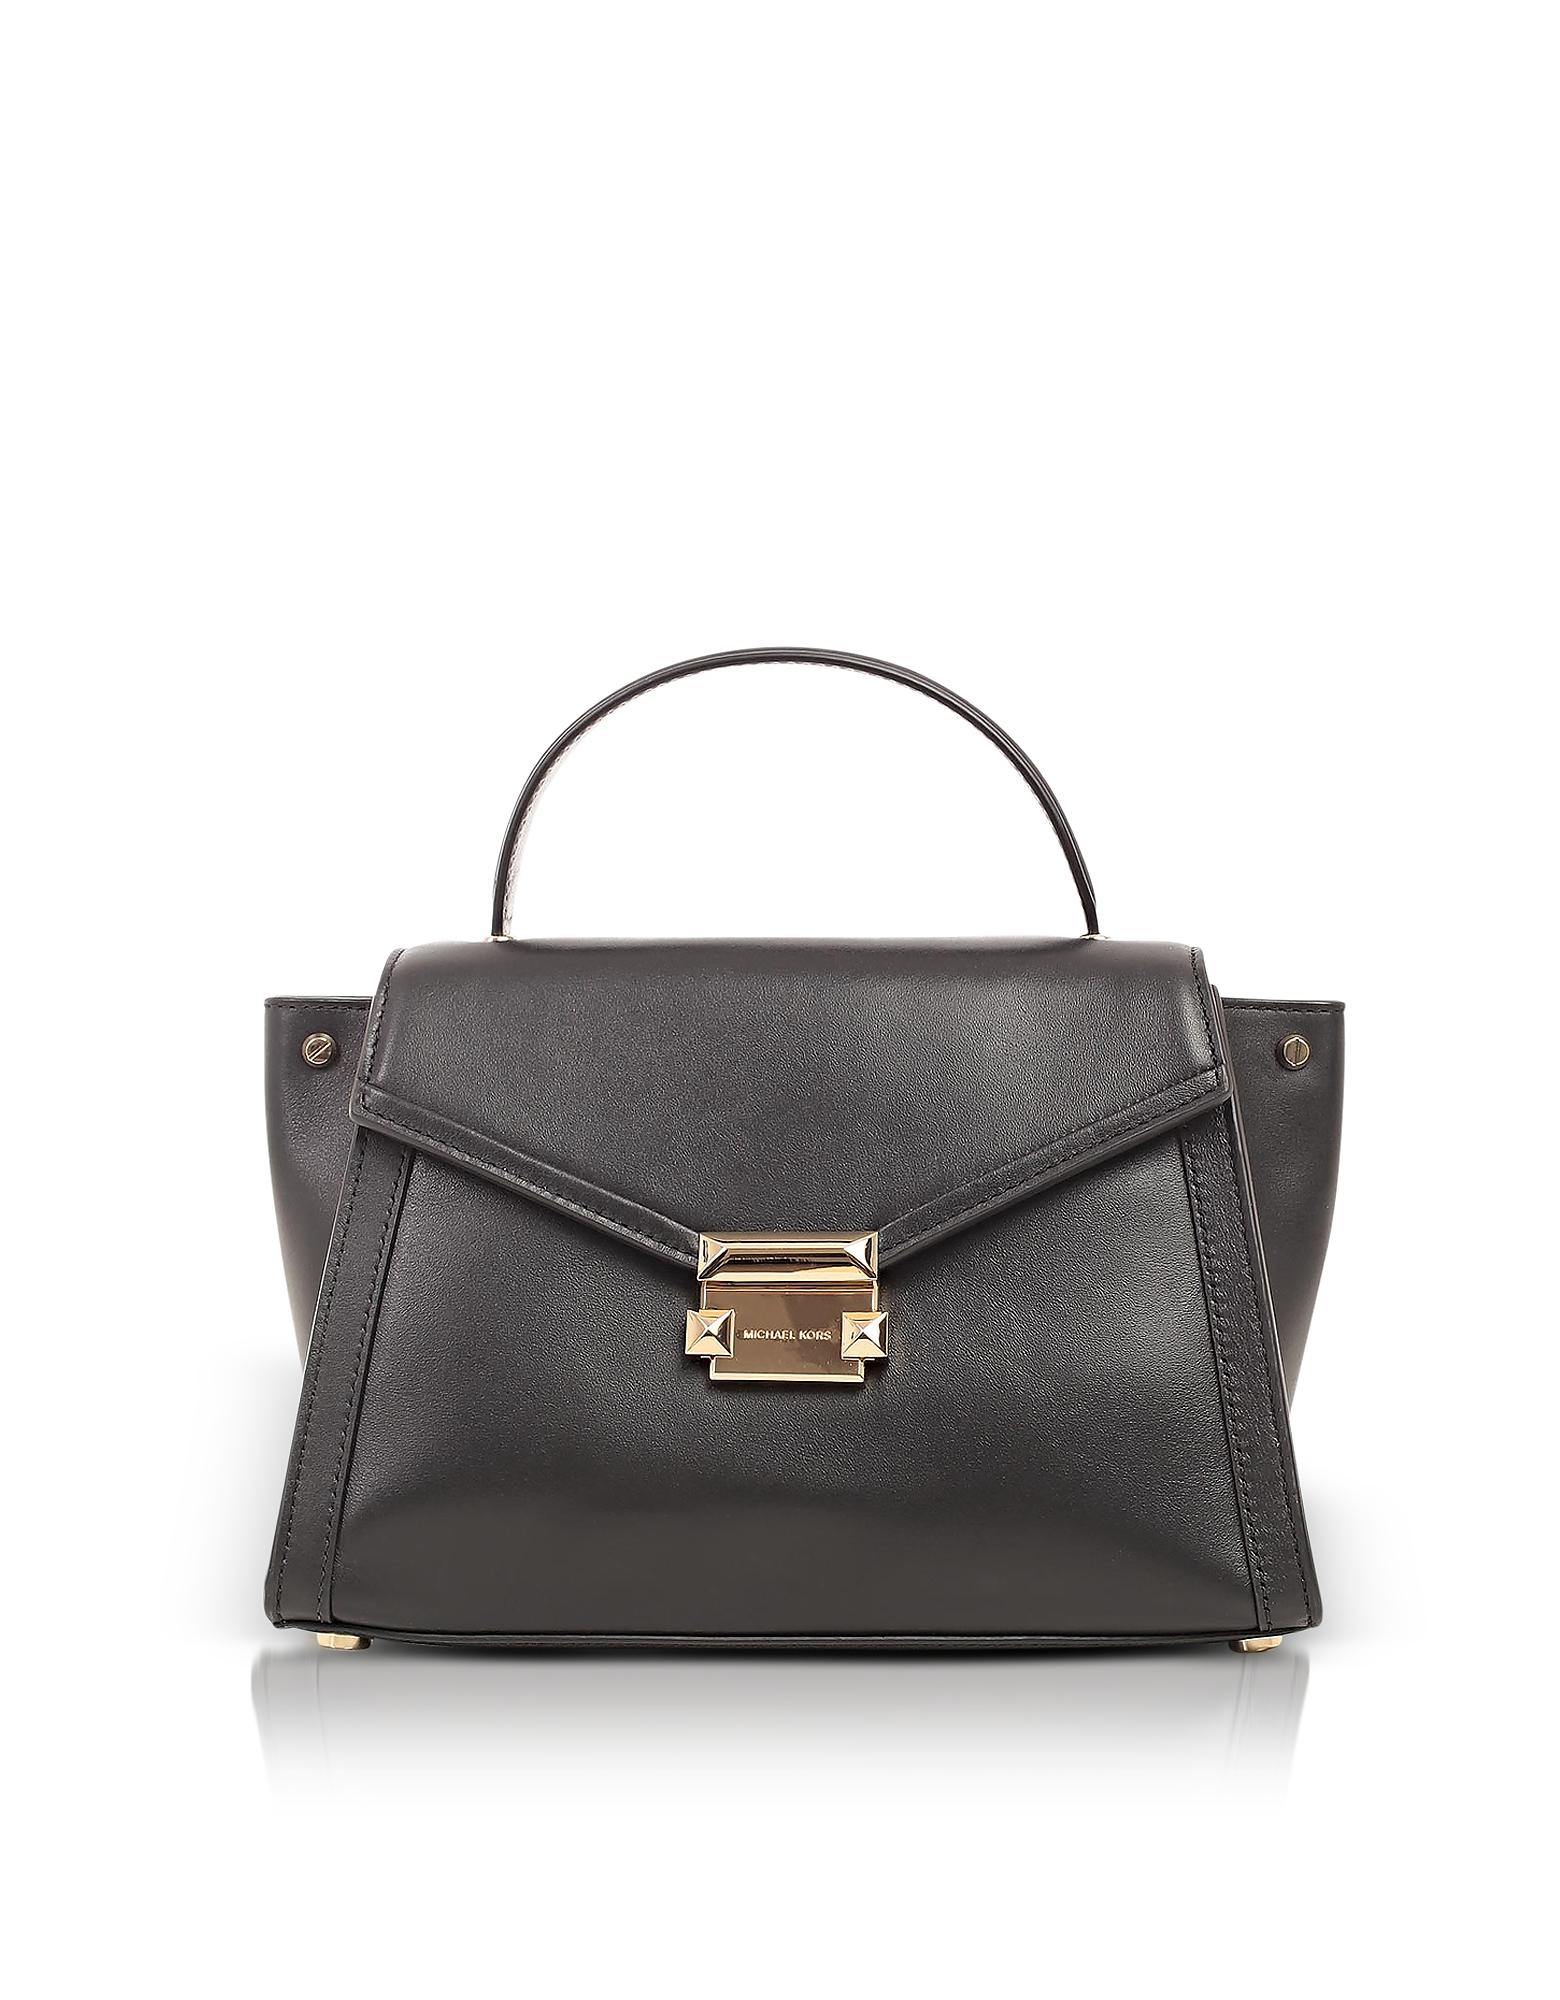 Whitney Medium Leather Satchel